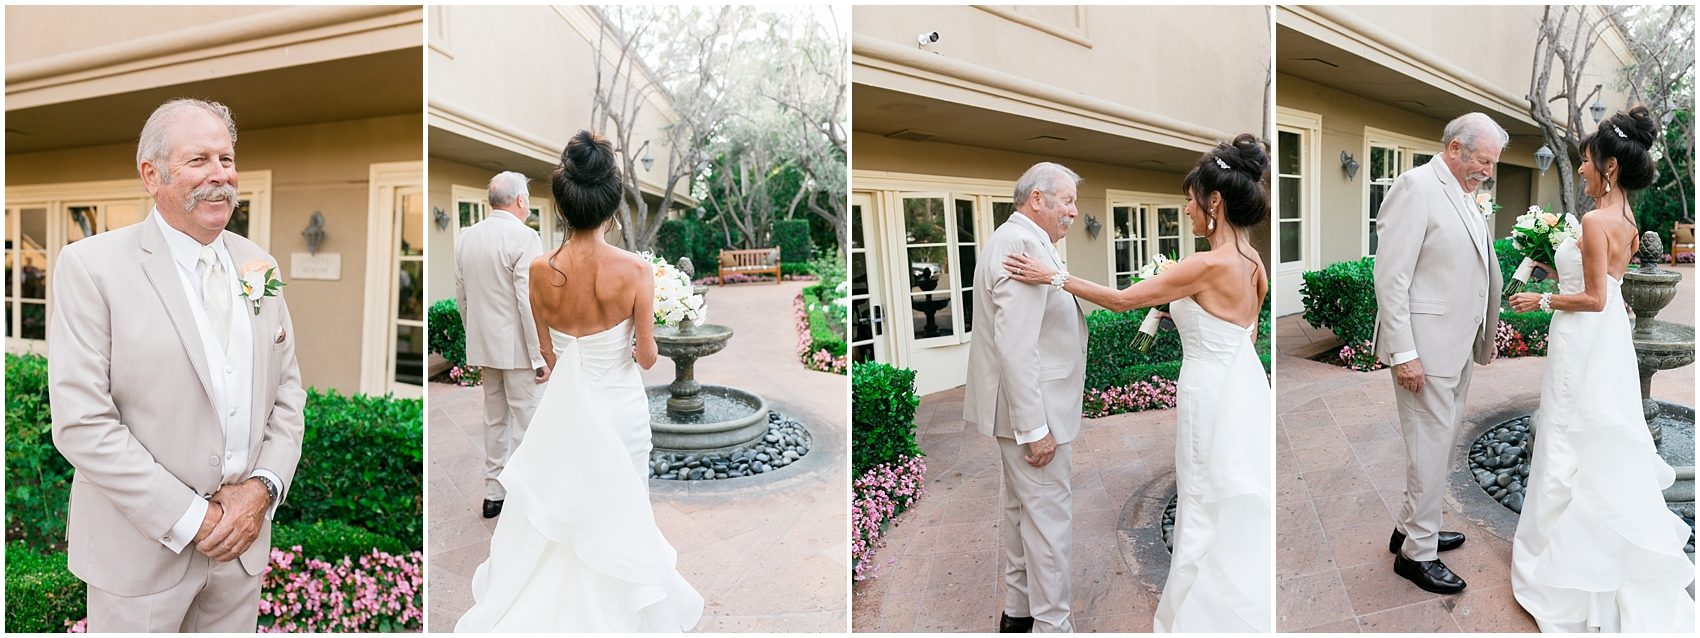 Rena and Louis_ Wedding-0091.jpg